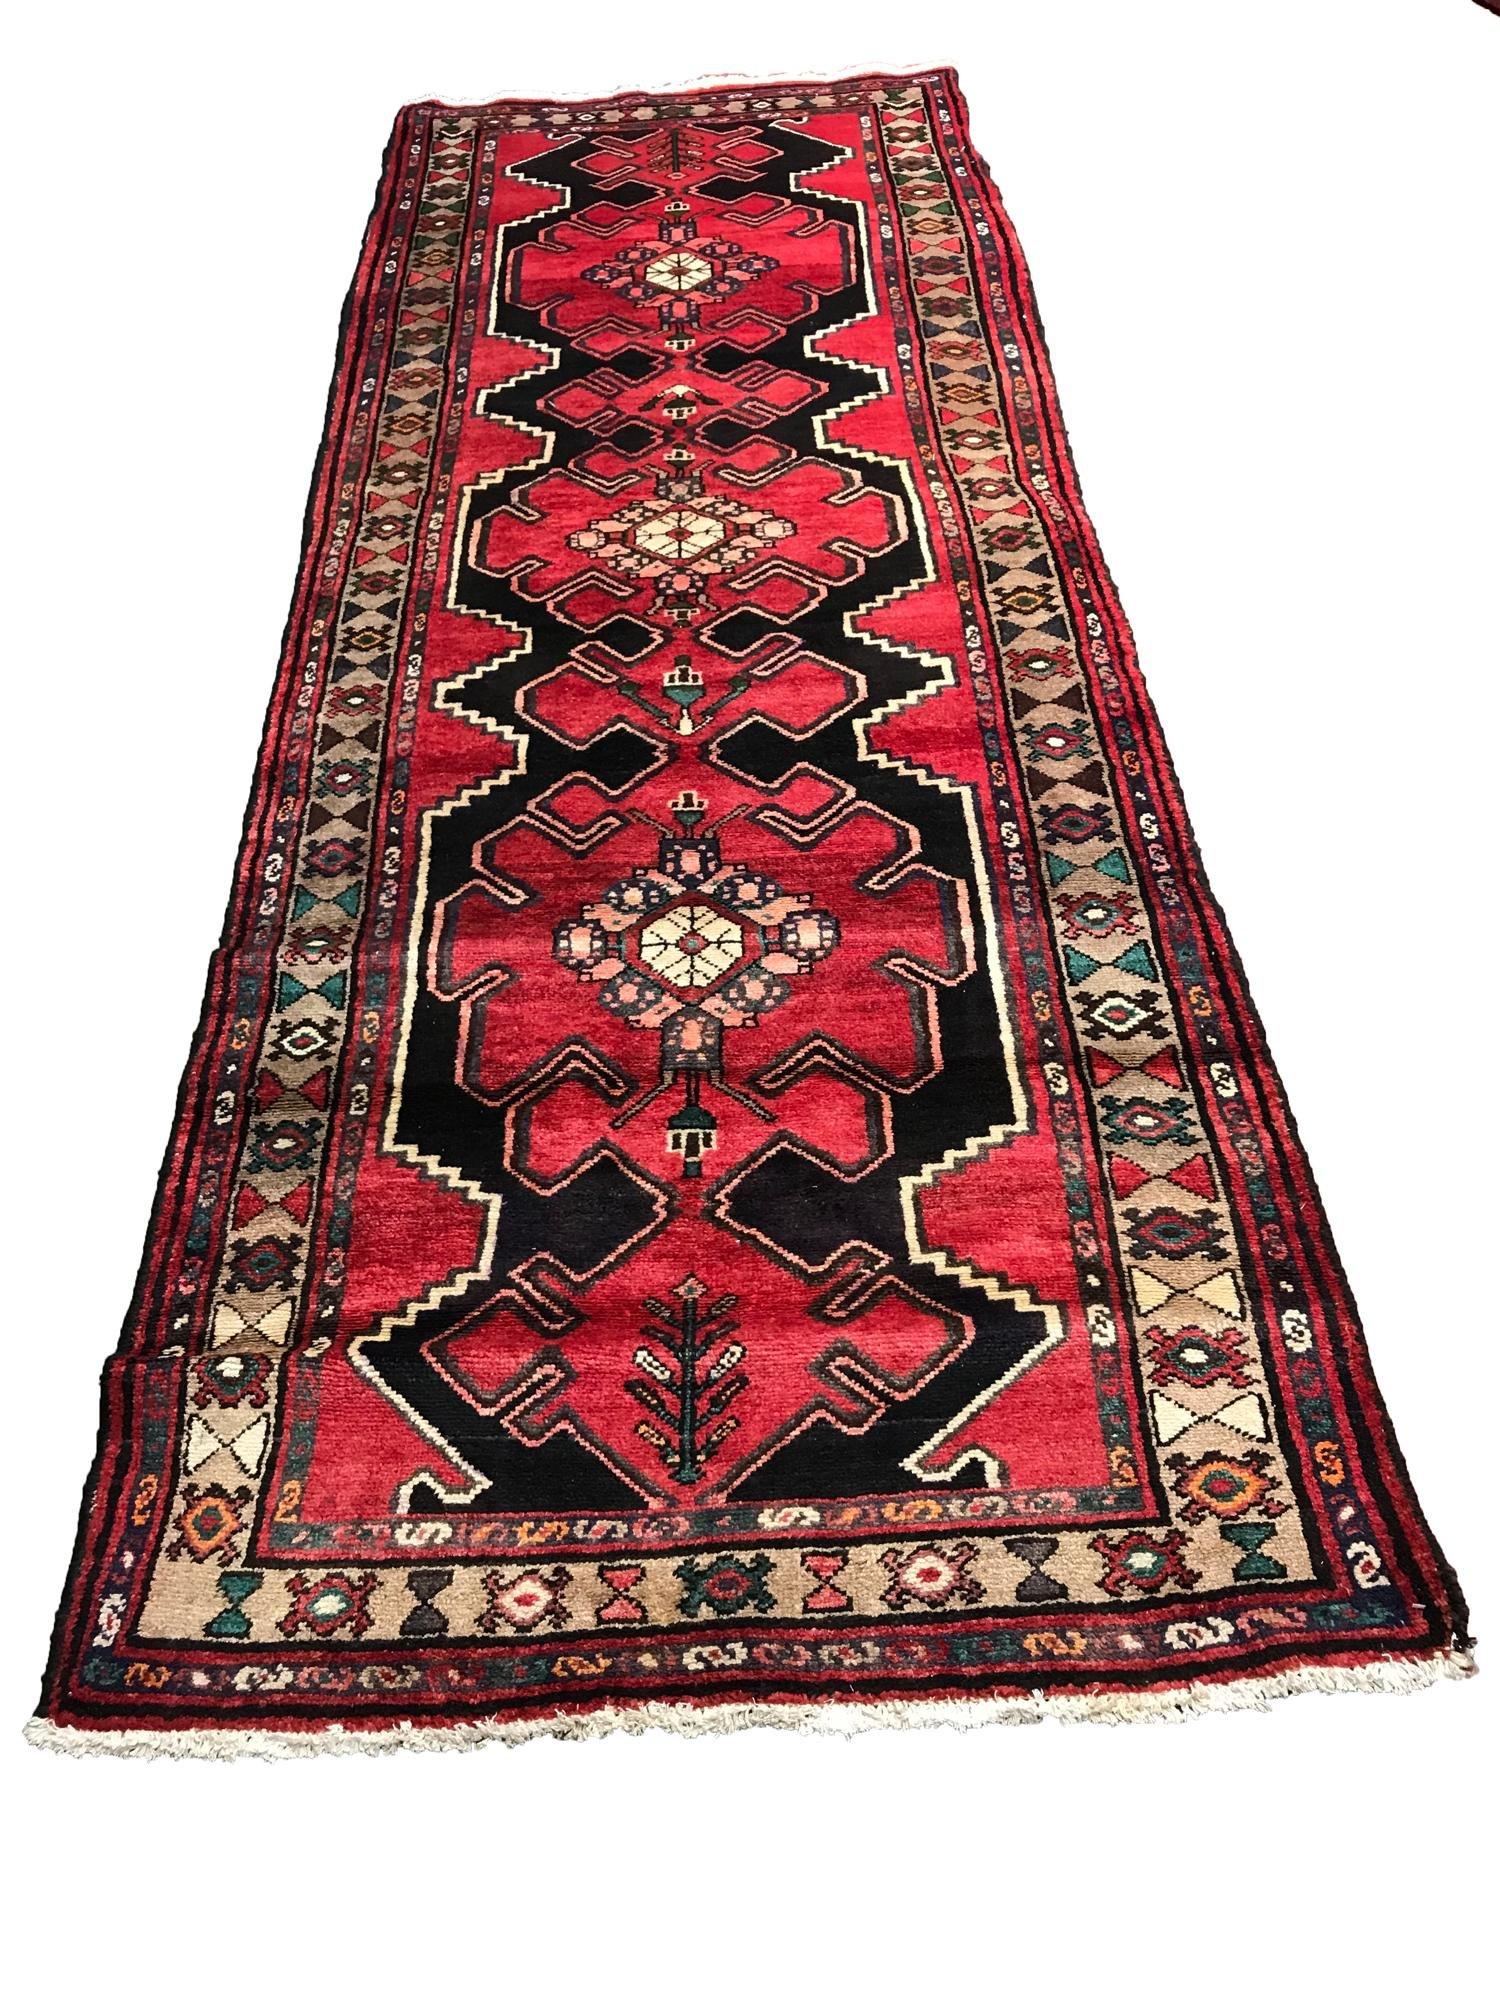 Persian Kashan MA424 style rug wool pile vintage hand